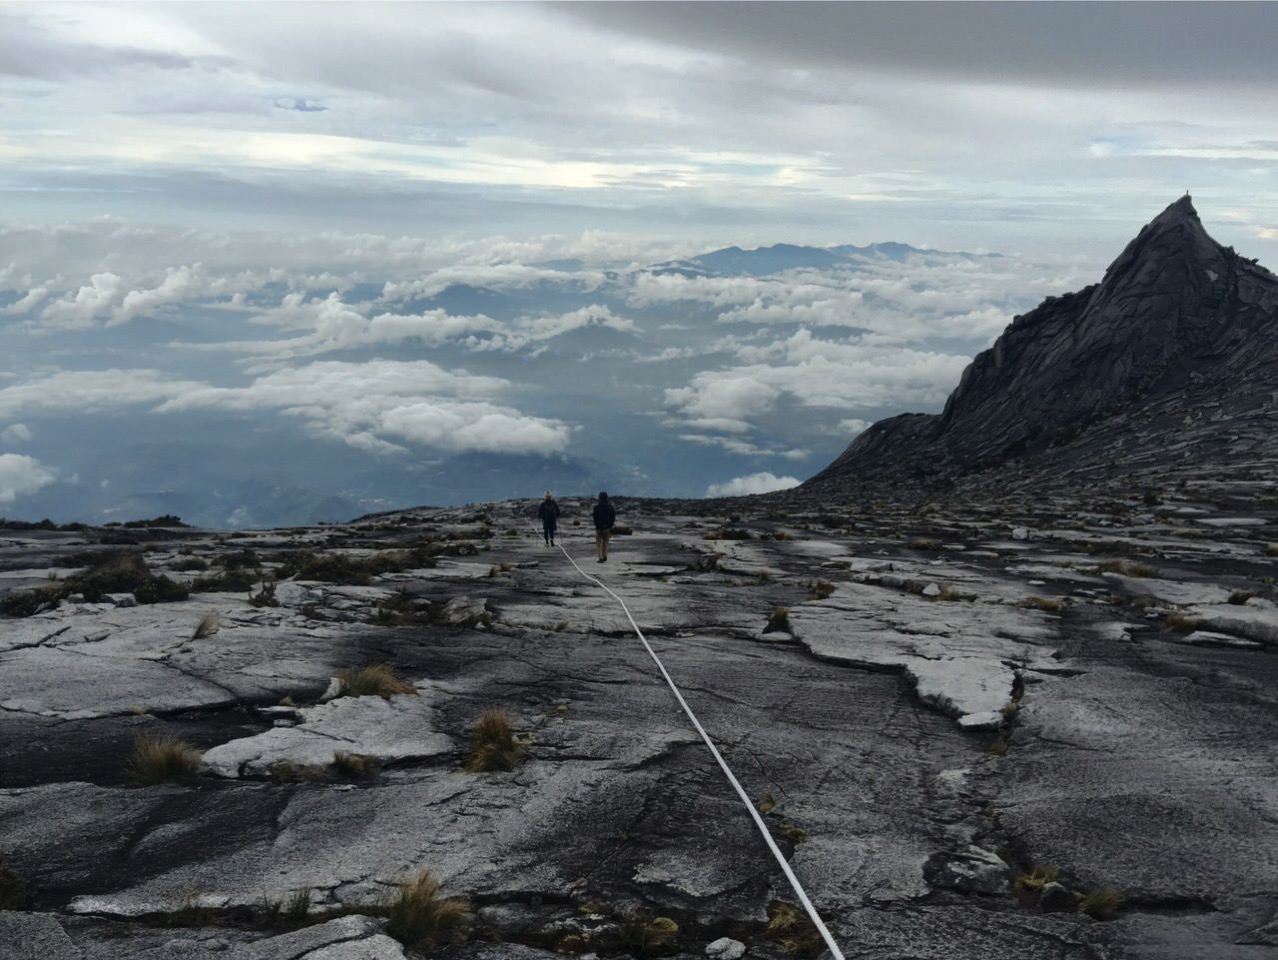 Kota Kinabalu climbing 4175